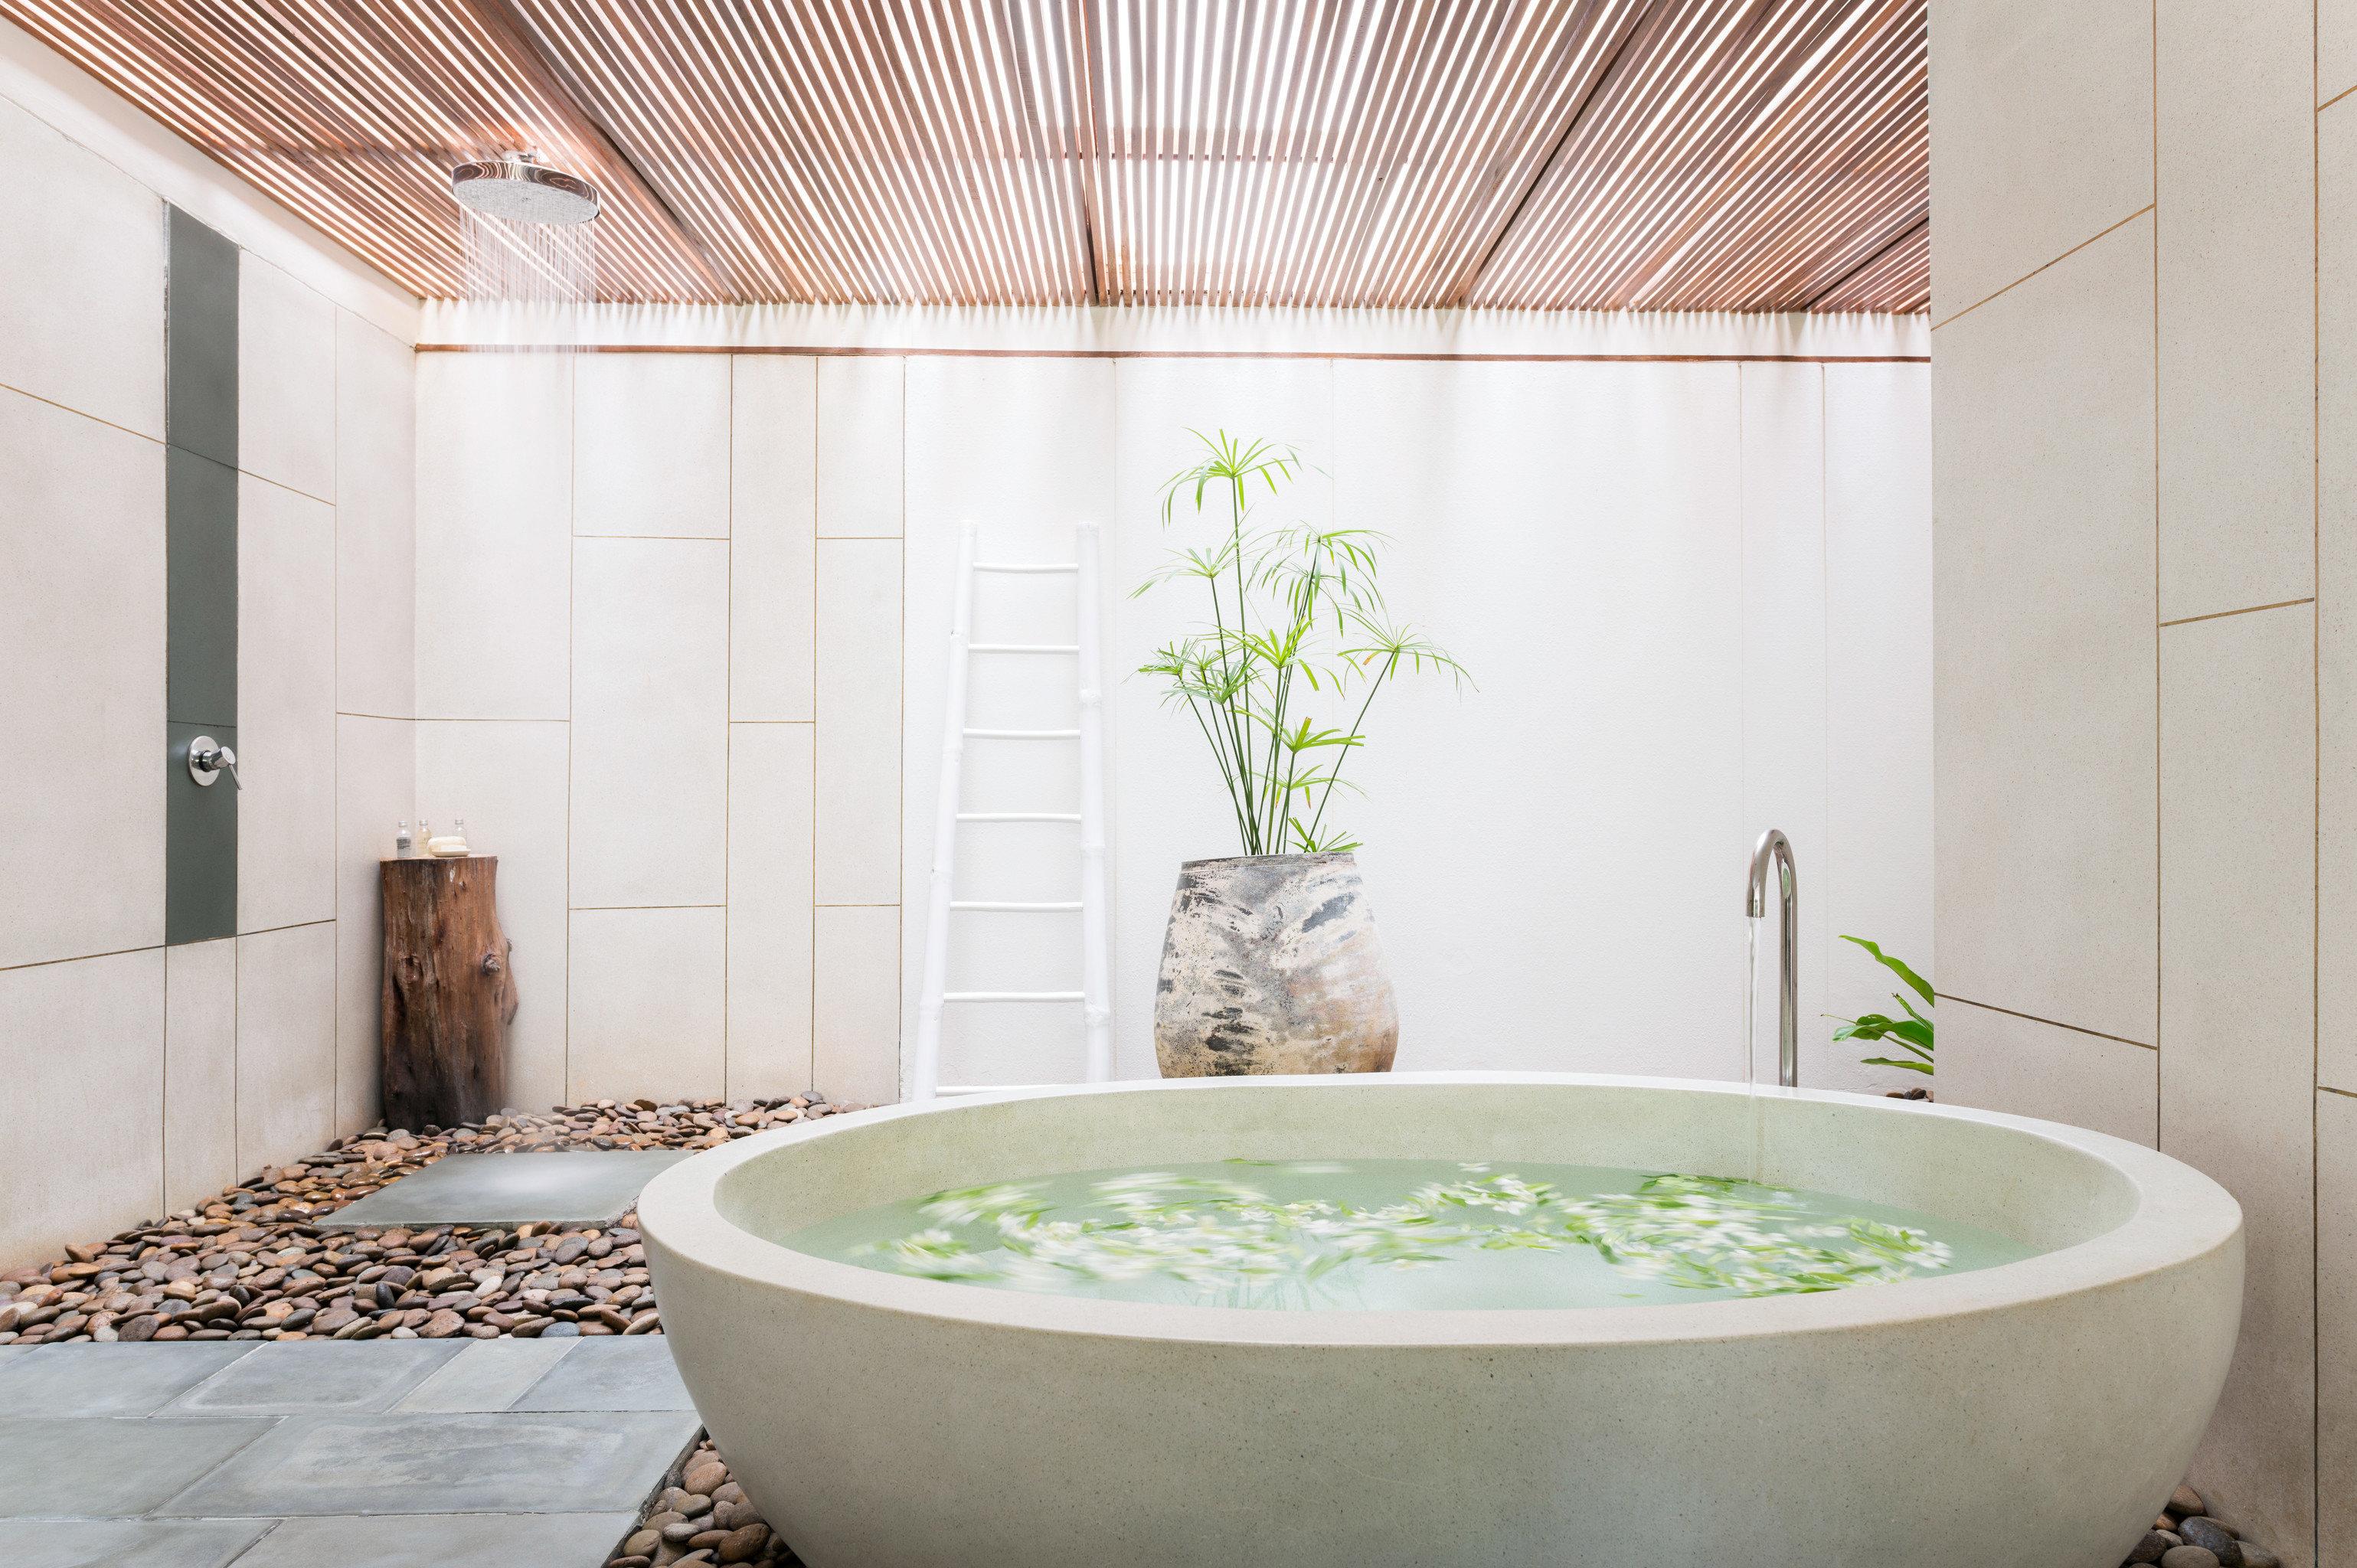 Bath Lounge Luxury Romantic bathroom bathtub plumbing fixture flooring sink swimming pool bidet tile tub